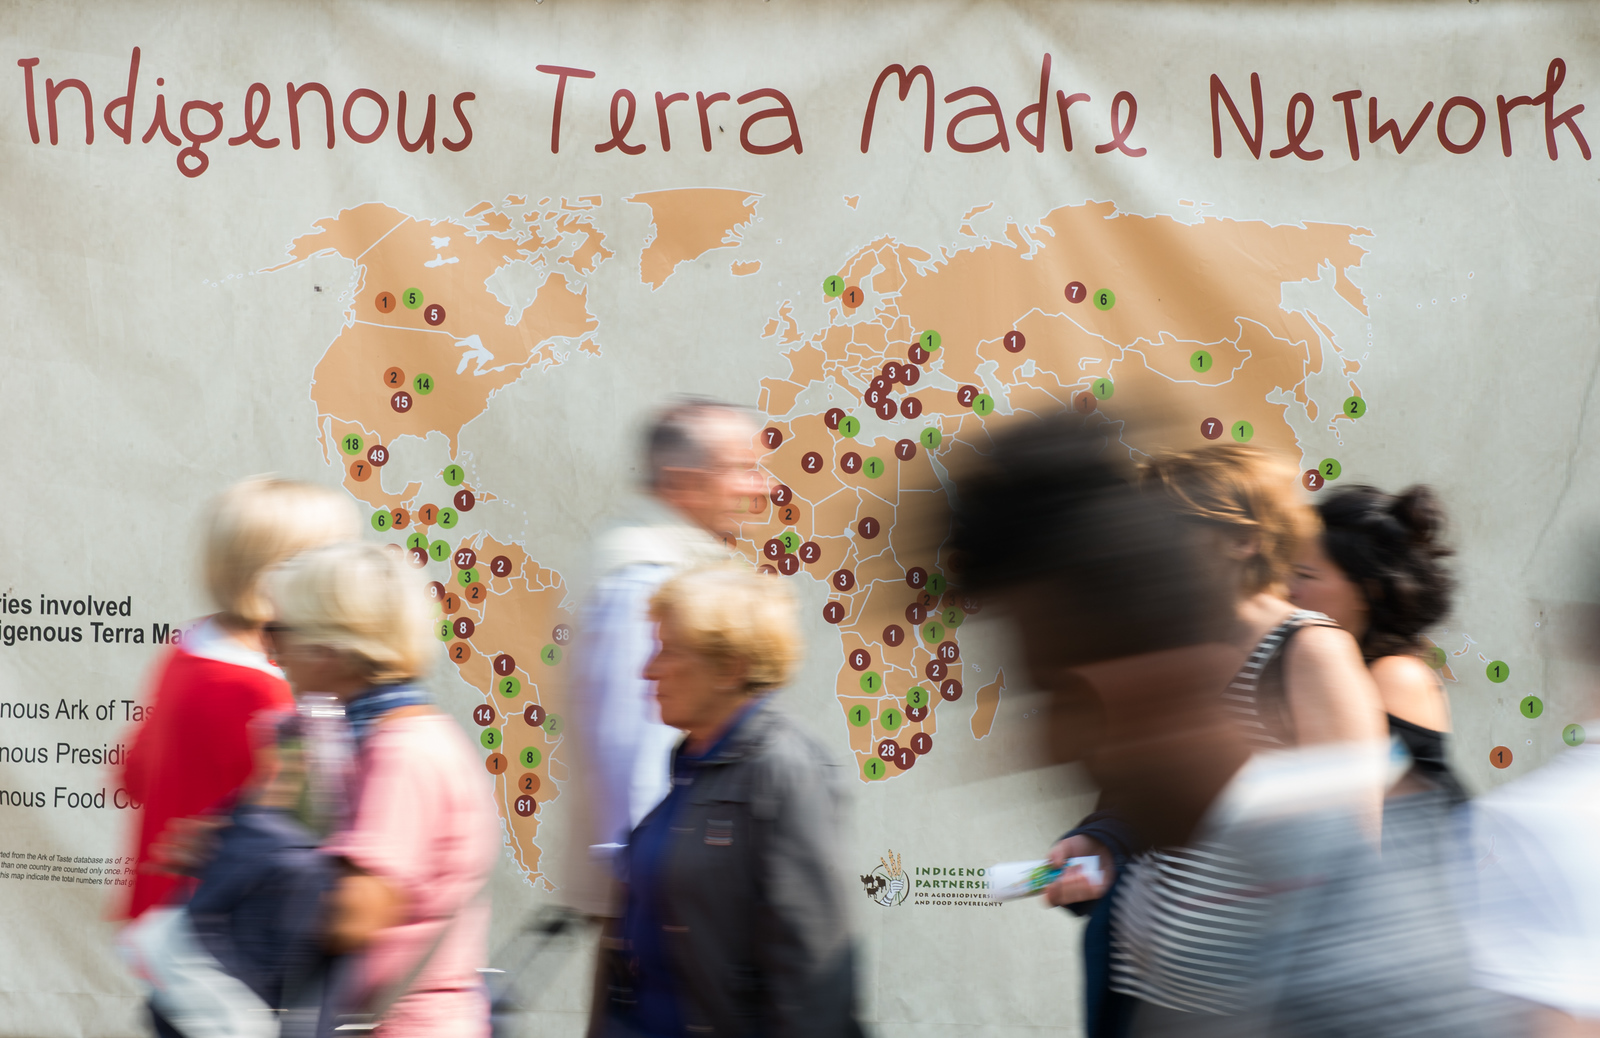 https://photos.smugmug.com/TMSDG2016/Momenti-di-Terra-Madre-e-Salon/i-Z8XZtBN/0/X3/Slowfood_Terramadre_Salonedelgusto_Torino-158-X3.jpg